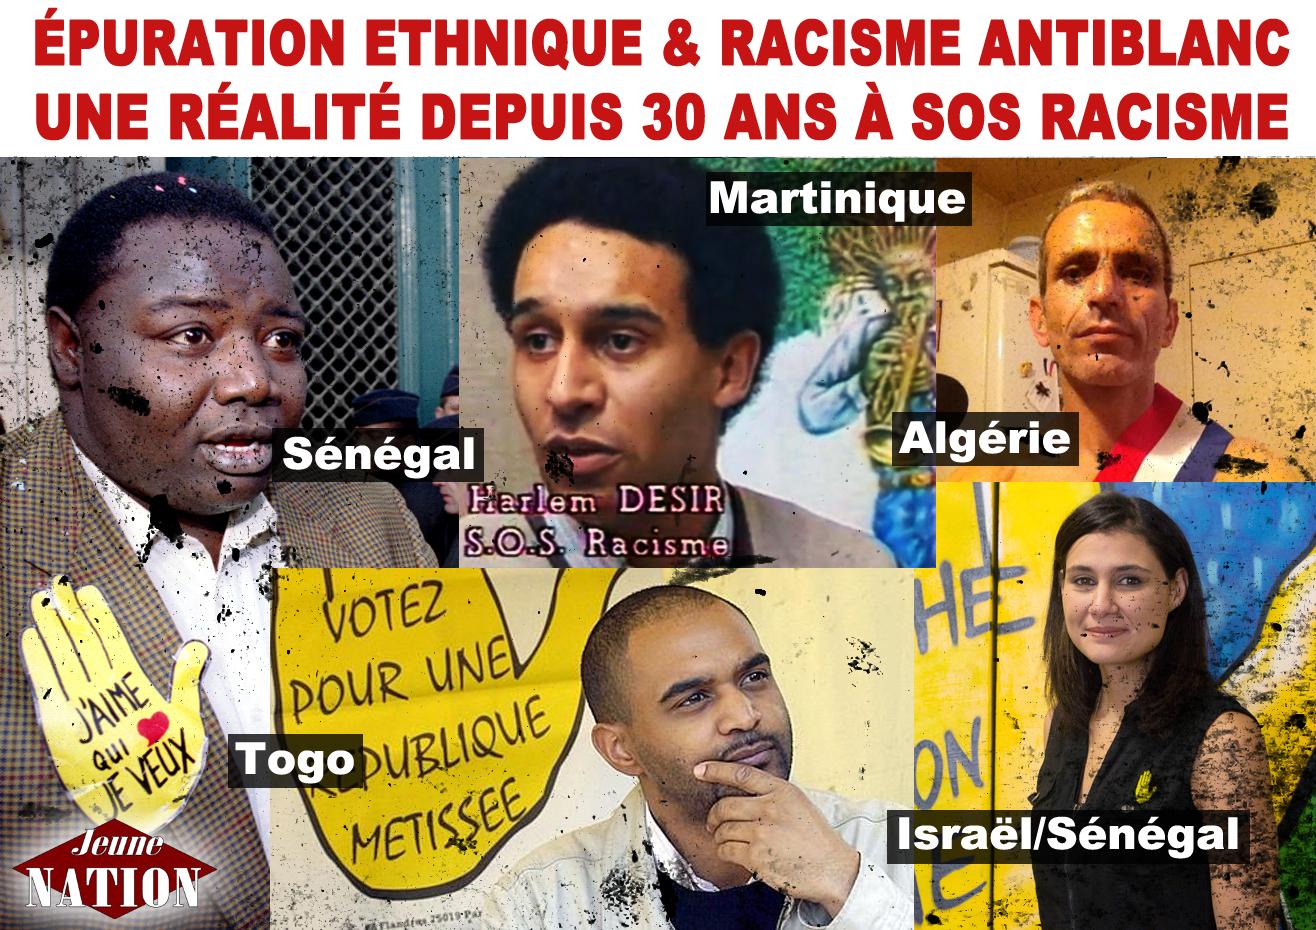 sos_racisme_epuration_ethnique-jn